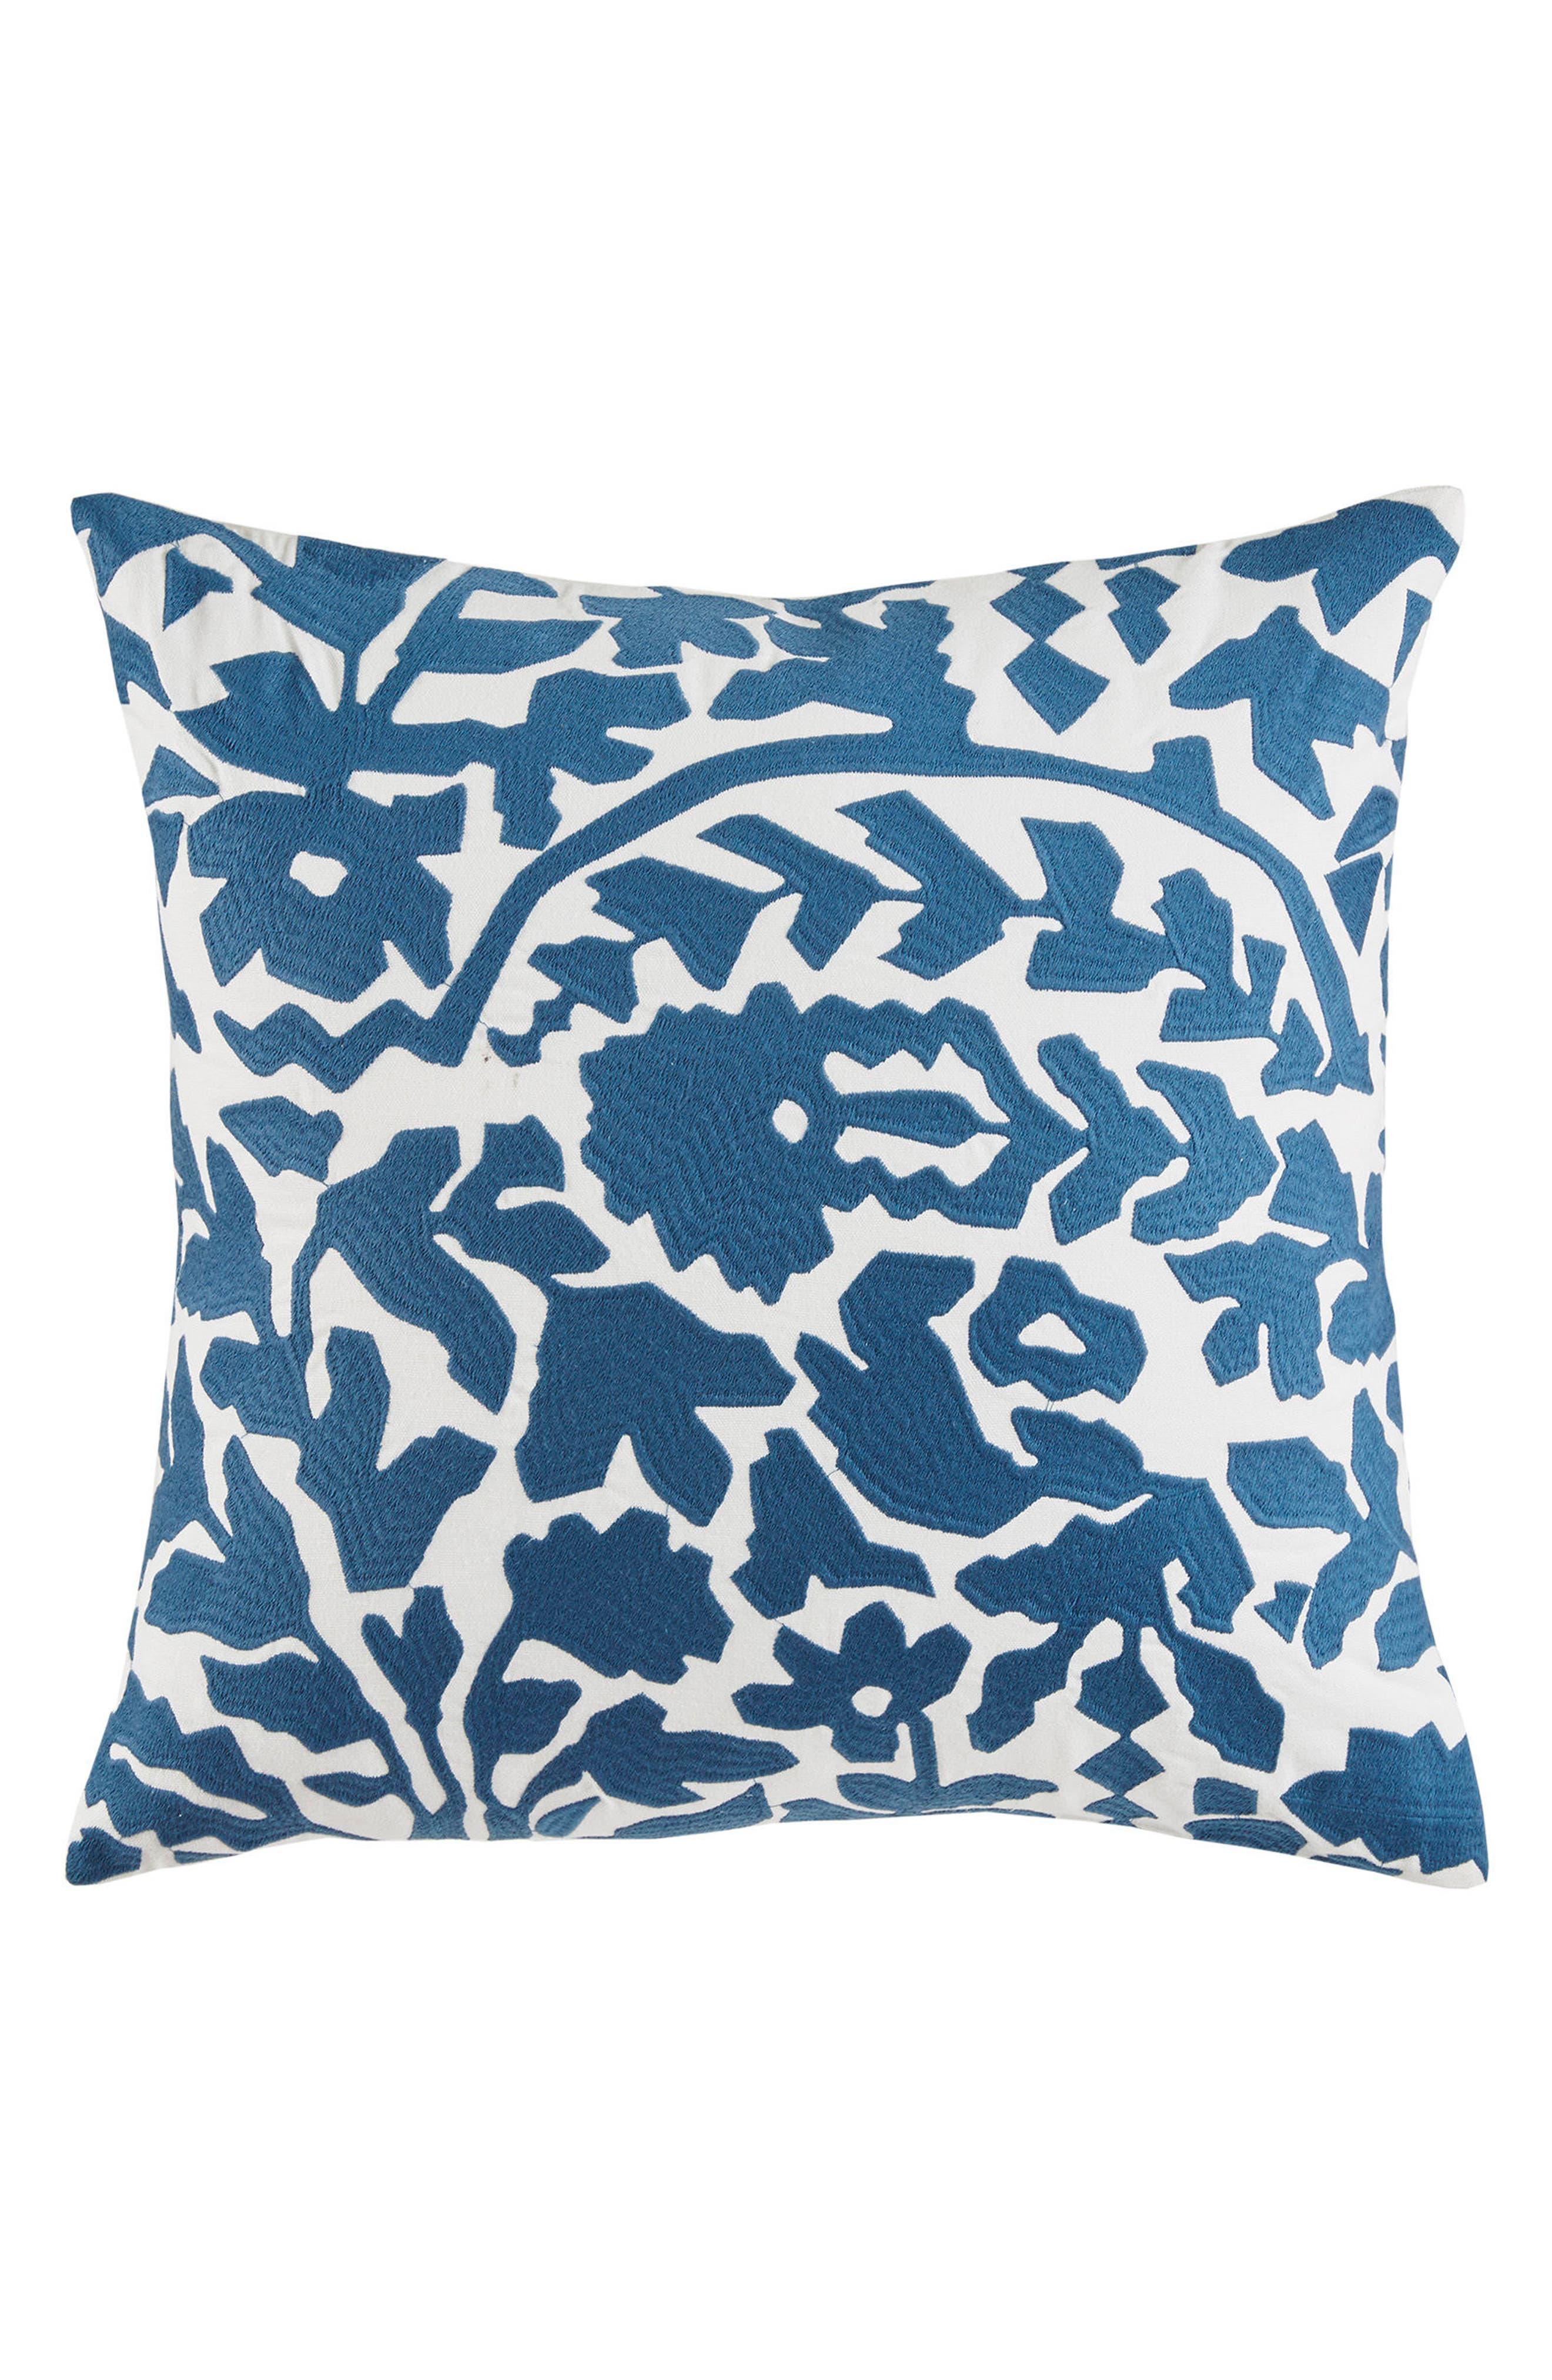 Oaxaca Floral Accent Pillow,                             Main thumbnail 1, color,                             Dark Blue